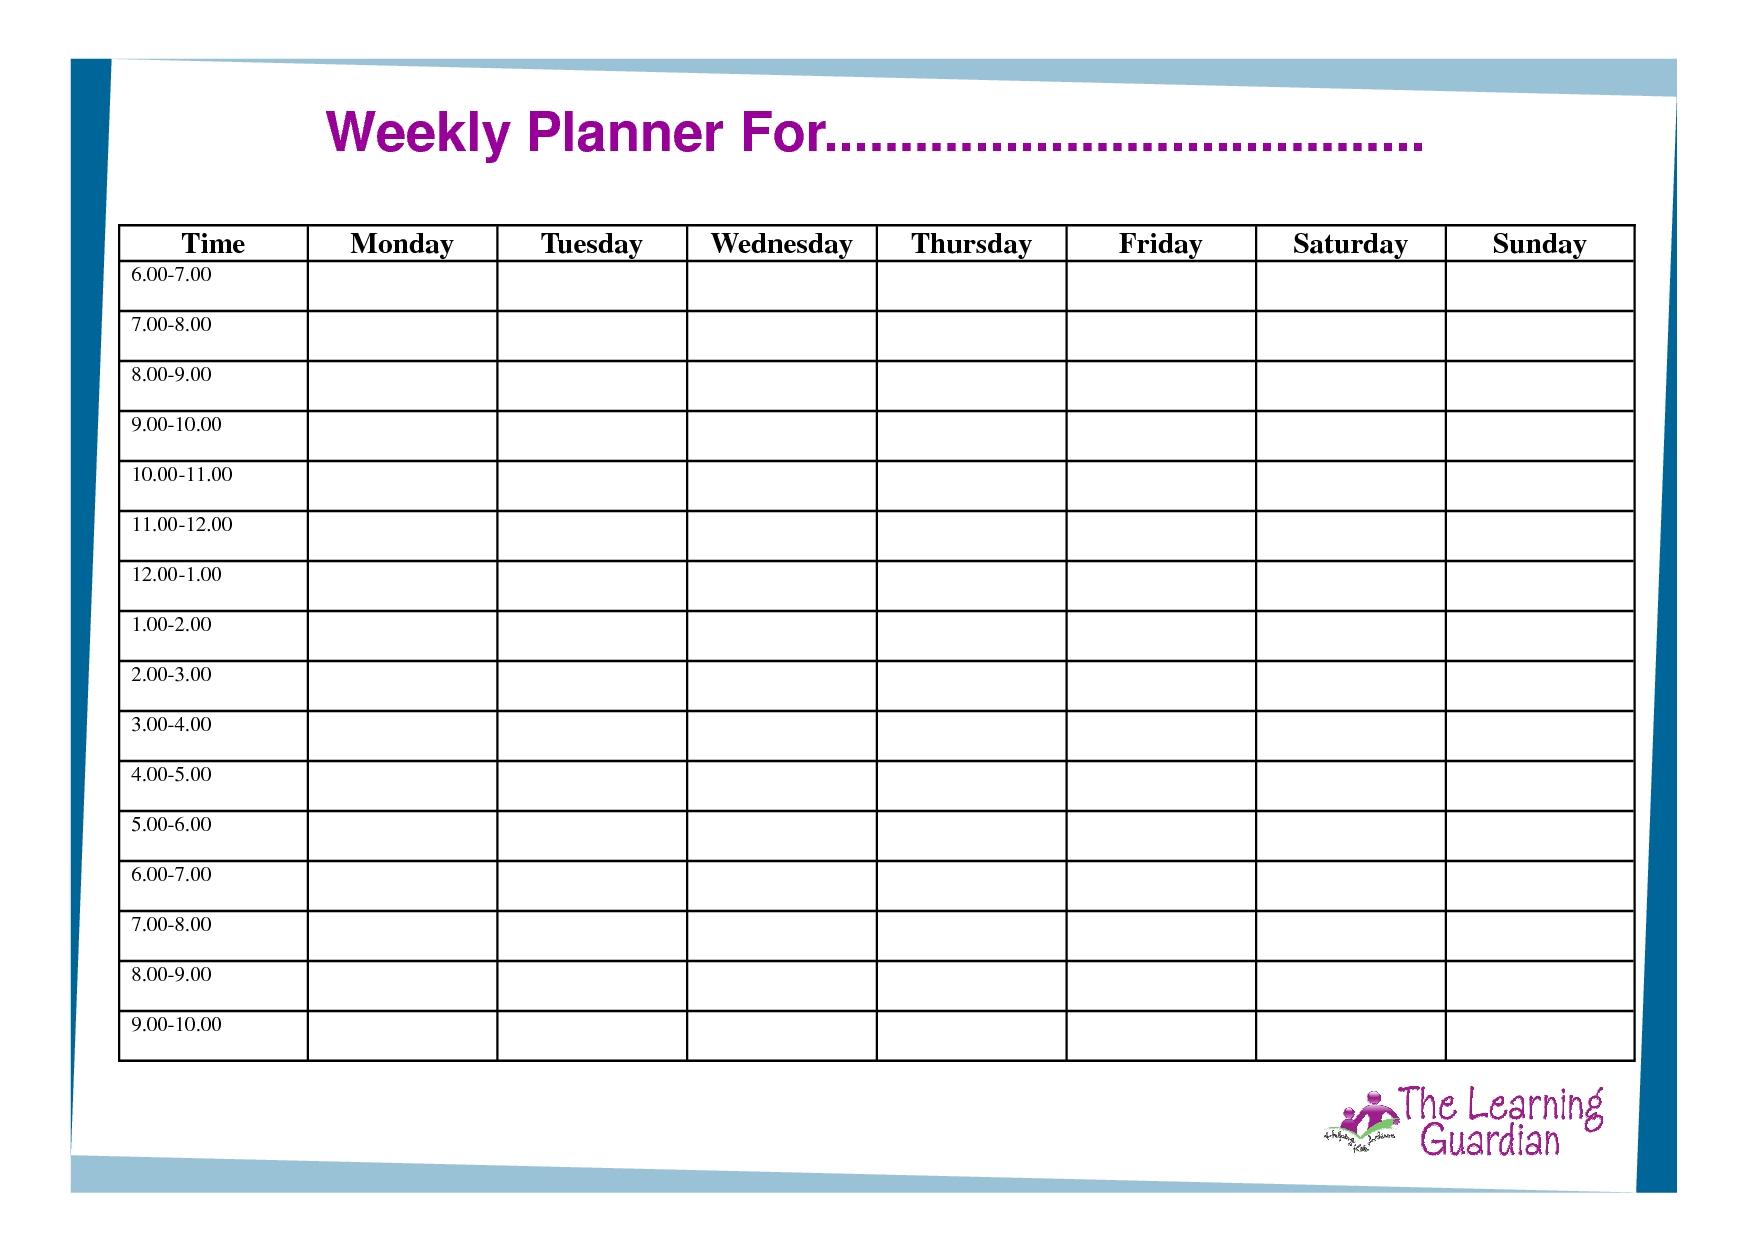 Week Calendar Template Day Blank | Smorad throughout Weekly Calendar Template 7 Day